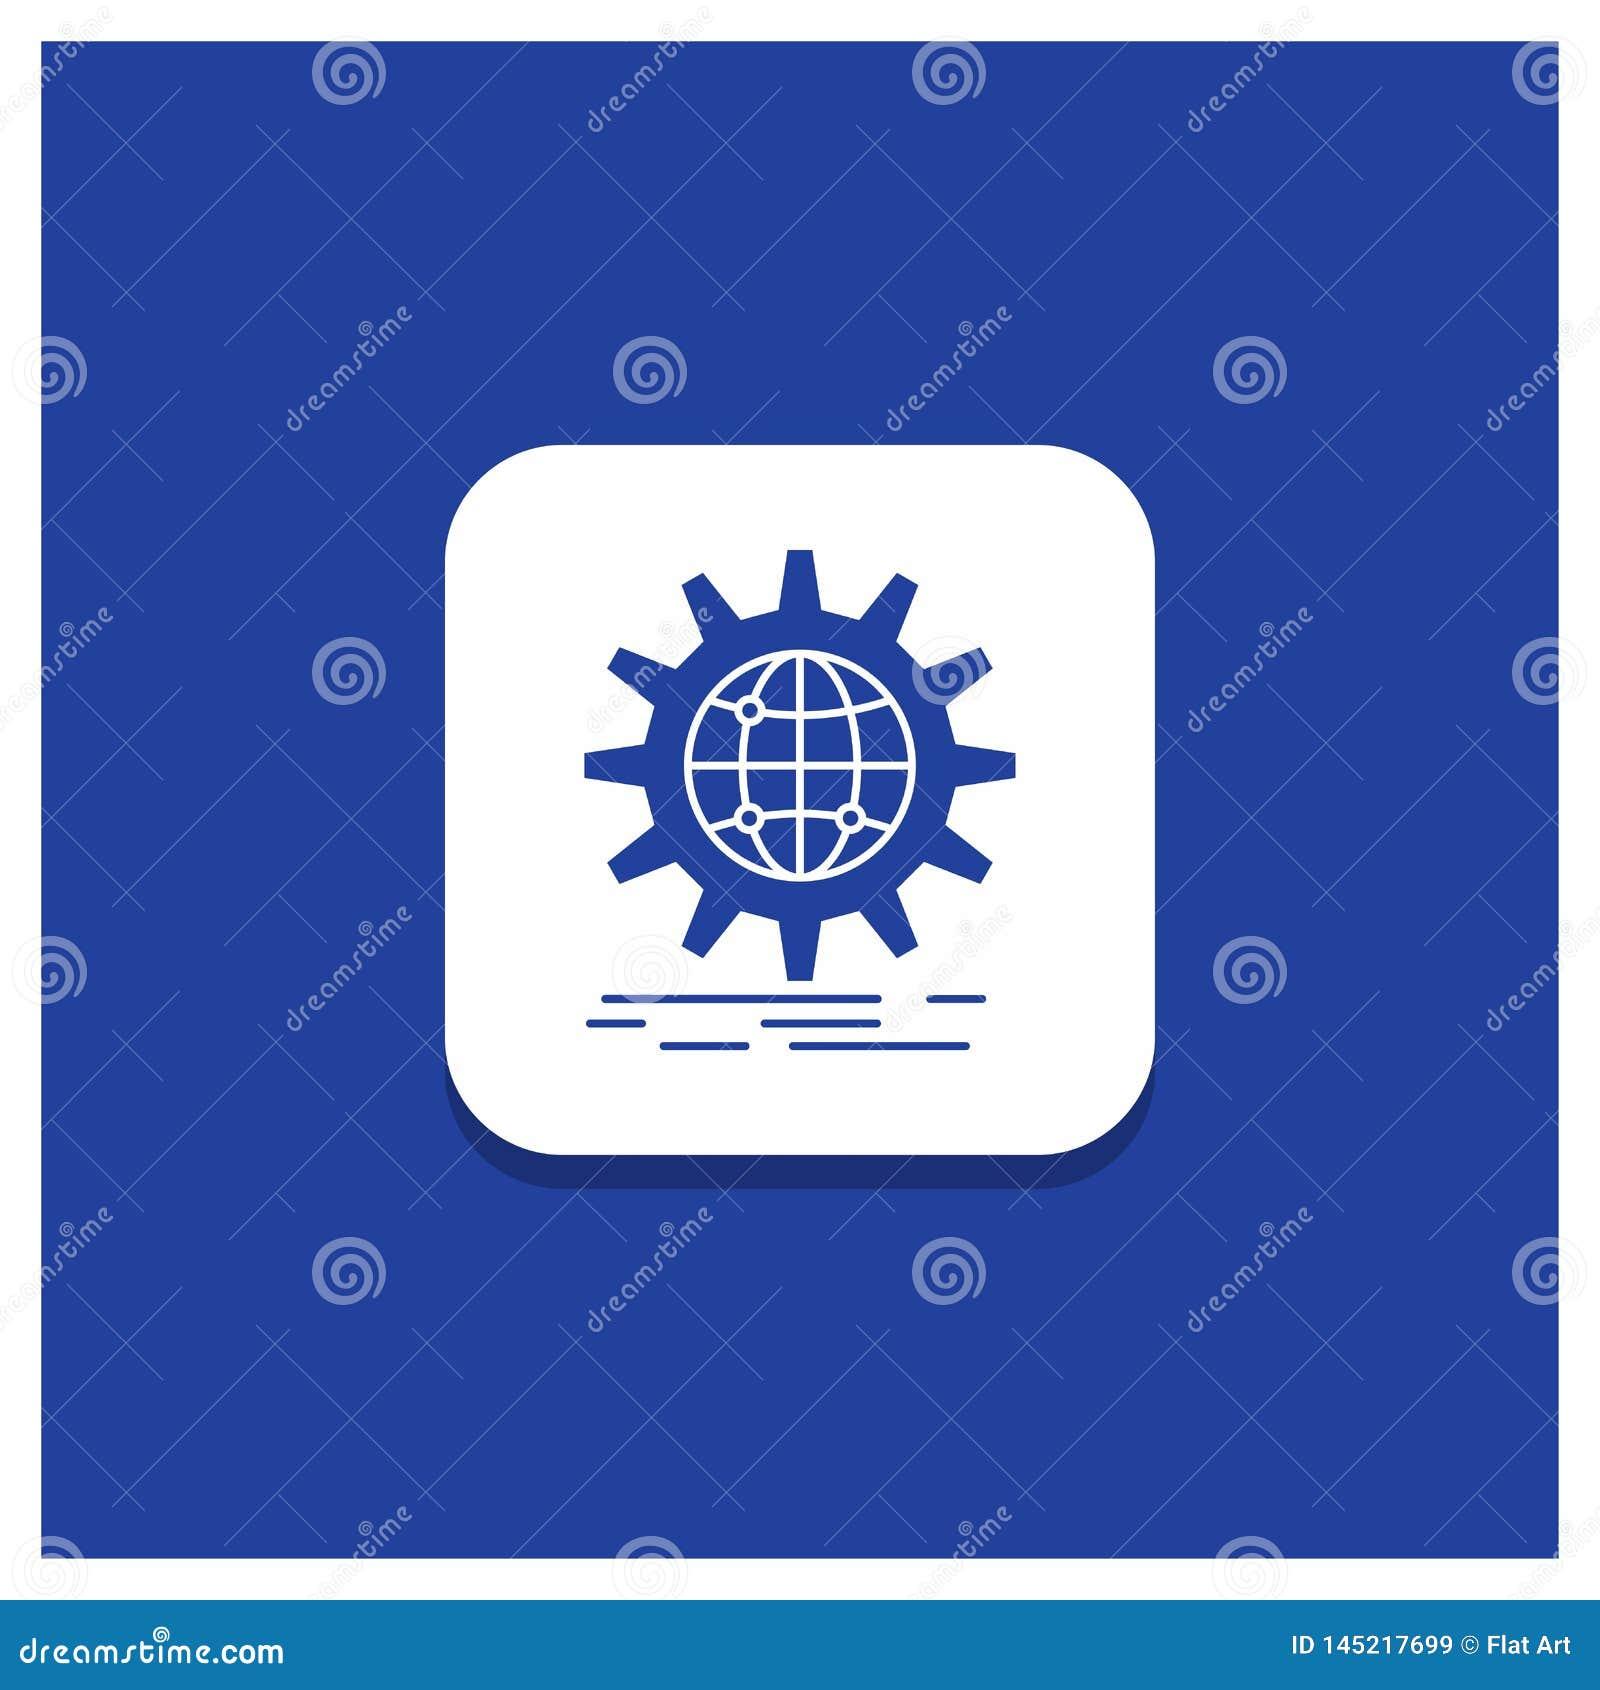 Blue Round Button for international, business, globe, world wide, gear Glyph icon